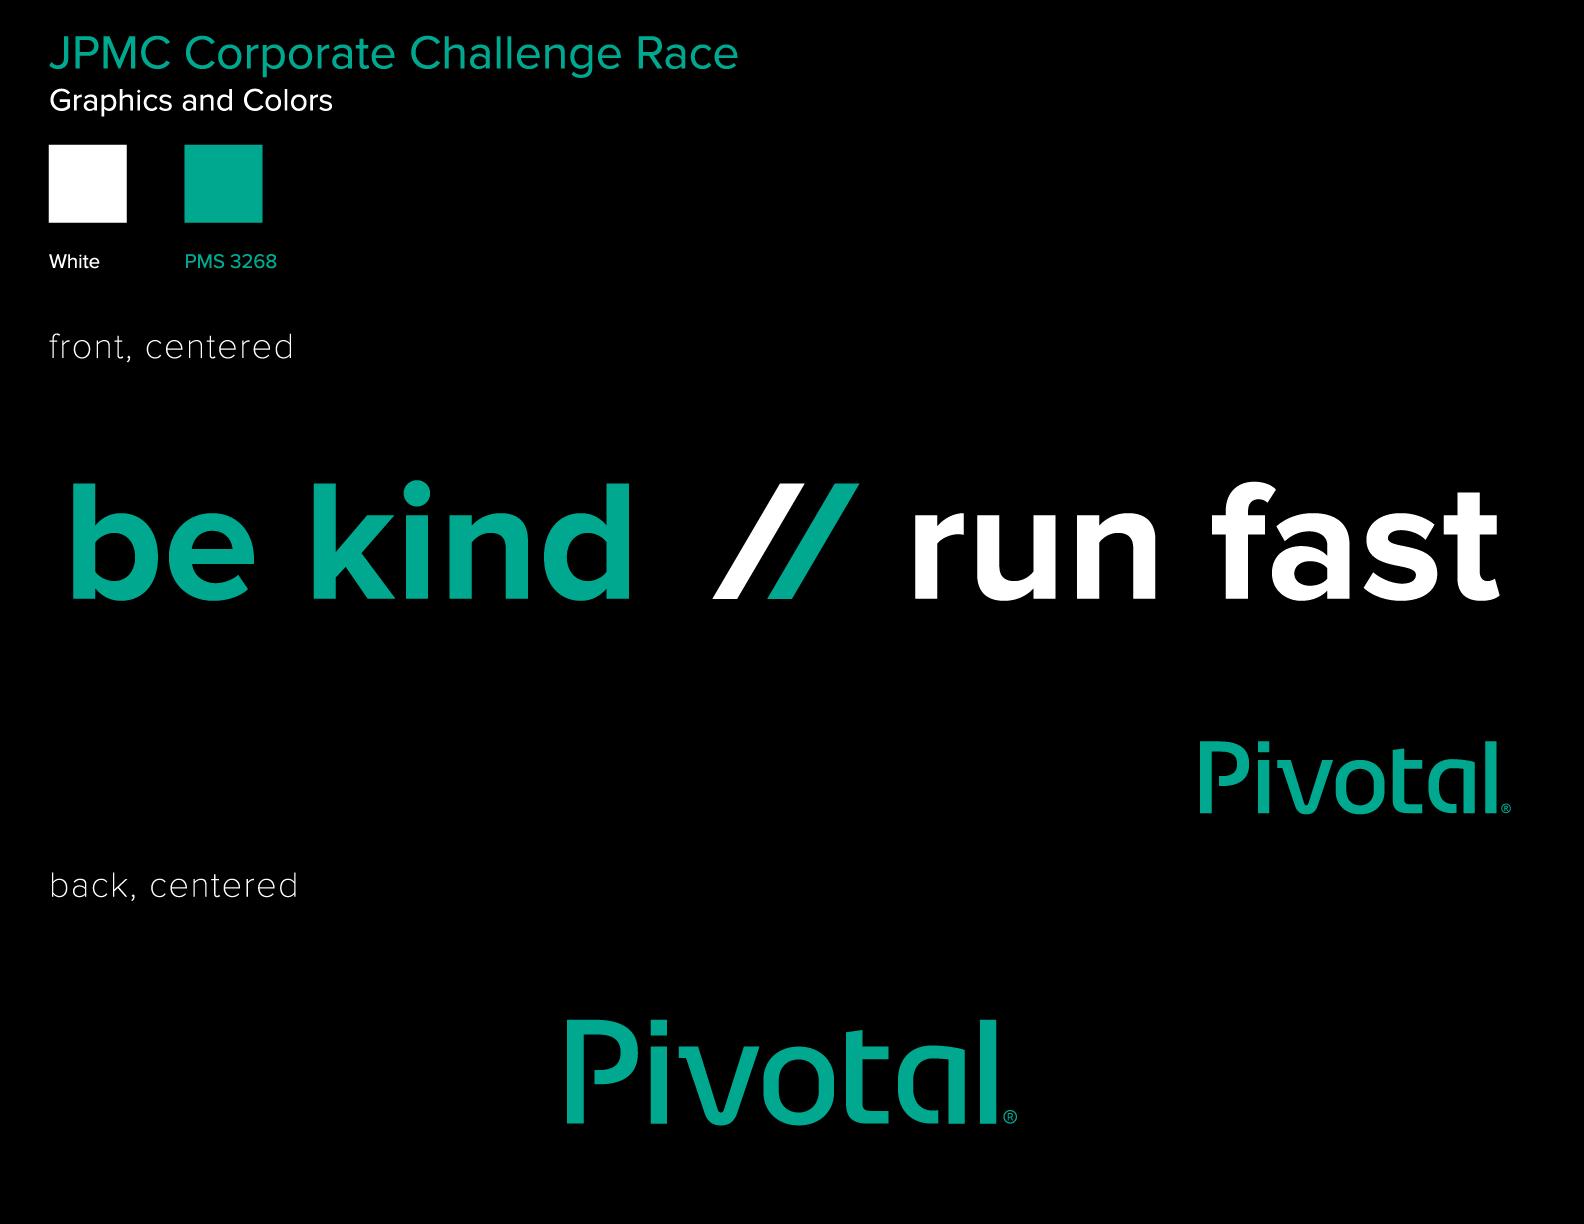 Pivotal-JPMC Race-page2.png